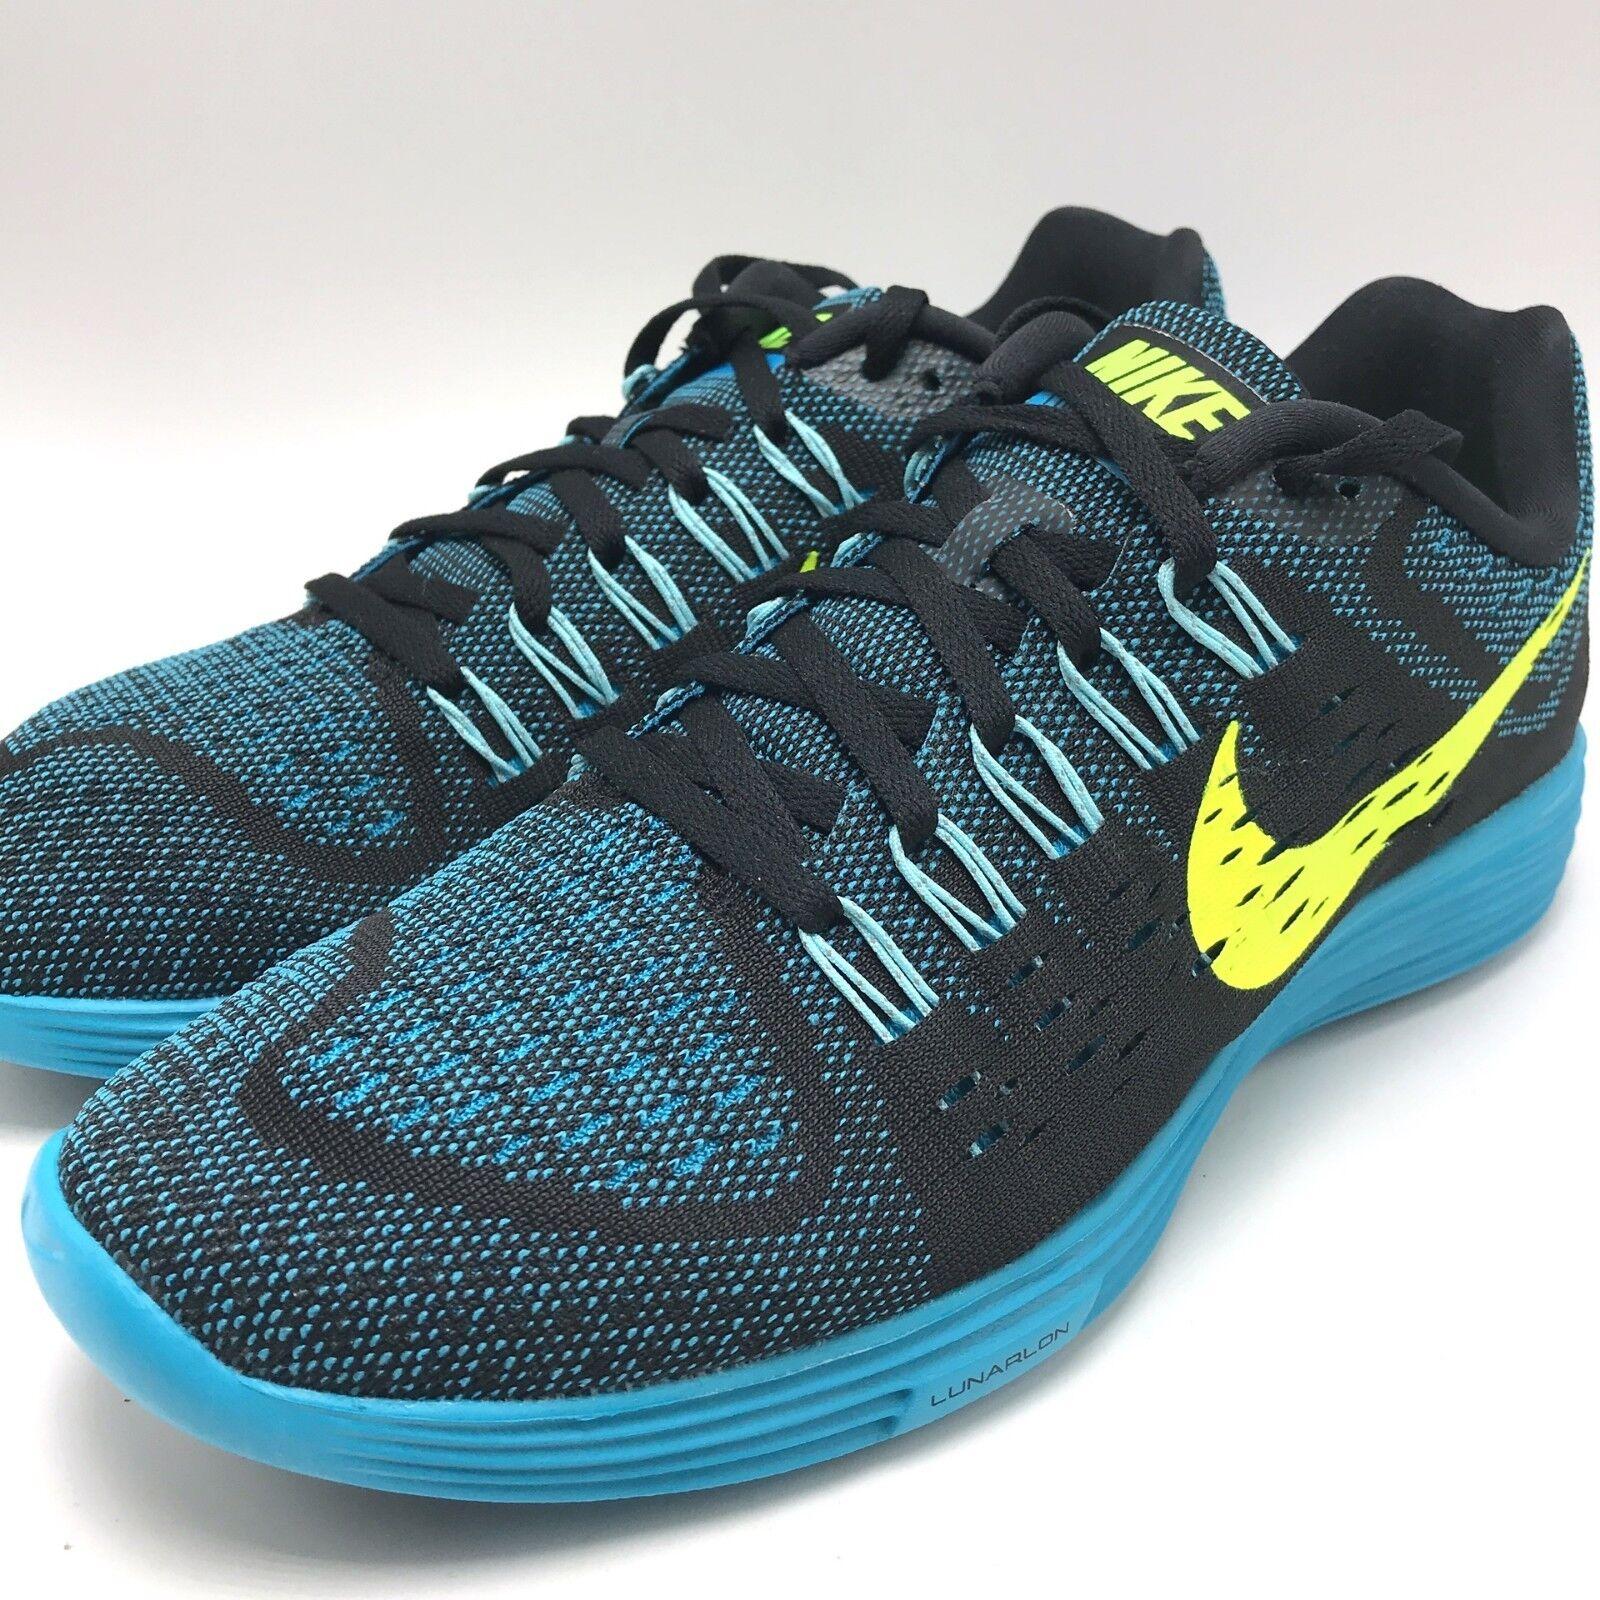 Nike lunartempo scarpe nero / volt laguna blu copa uomini scarpe lunartempo da corsa 705461-007 6abfa3